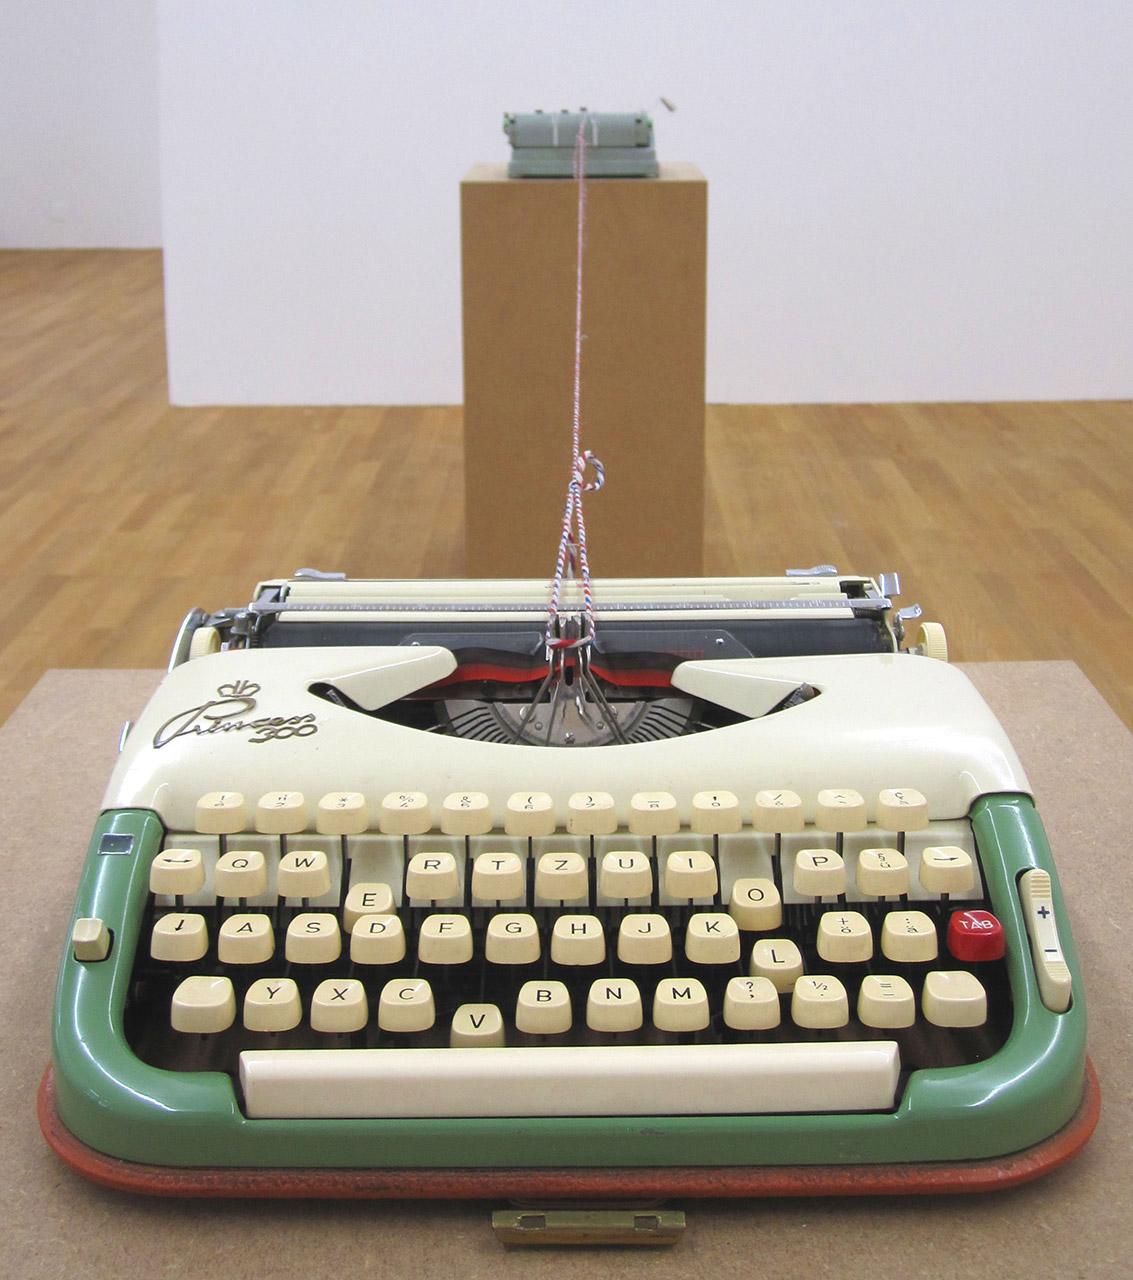 Martin-Soto-Climent-Kunsthalle-Winterthur-2012-3.jpg